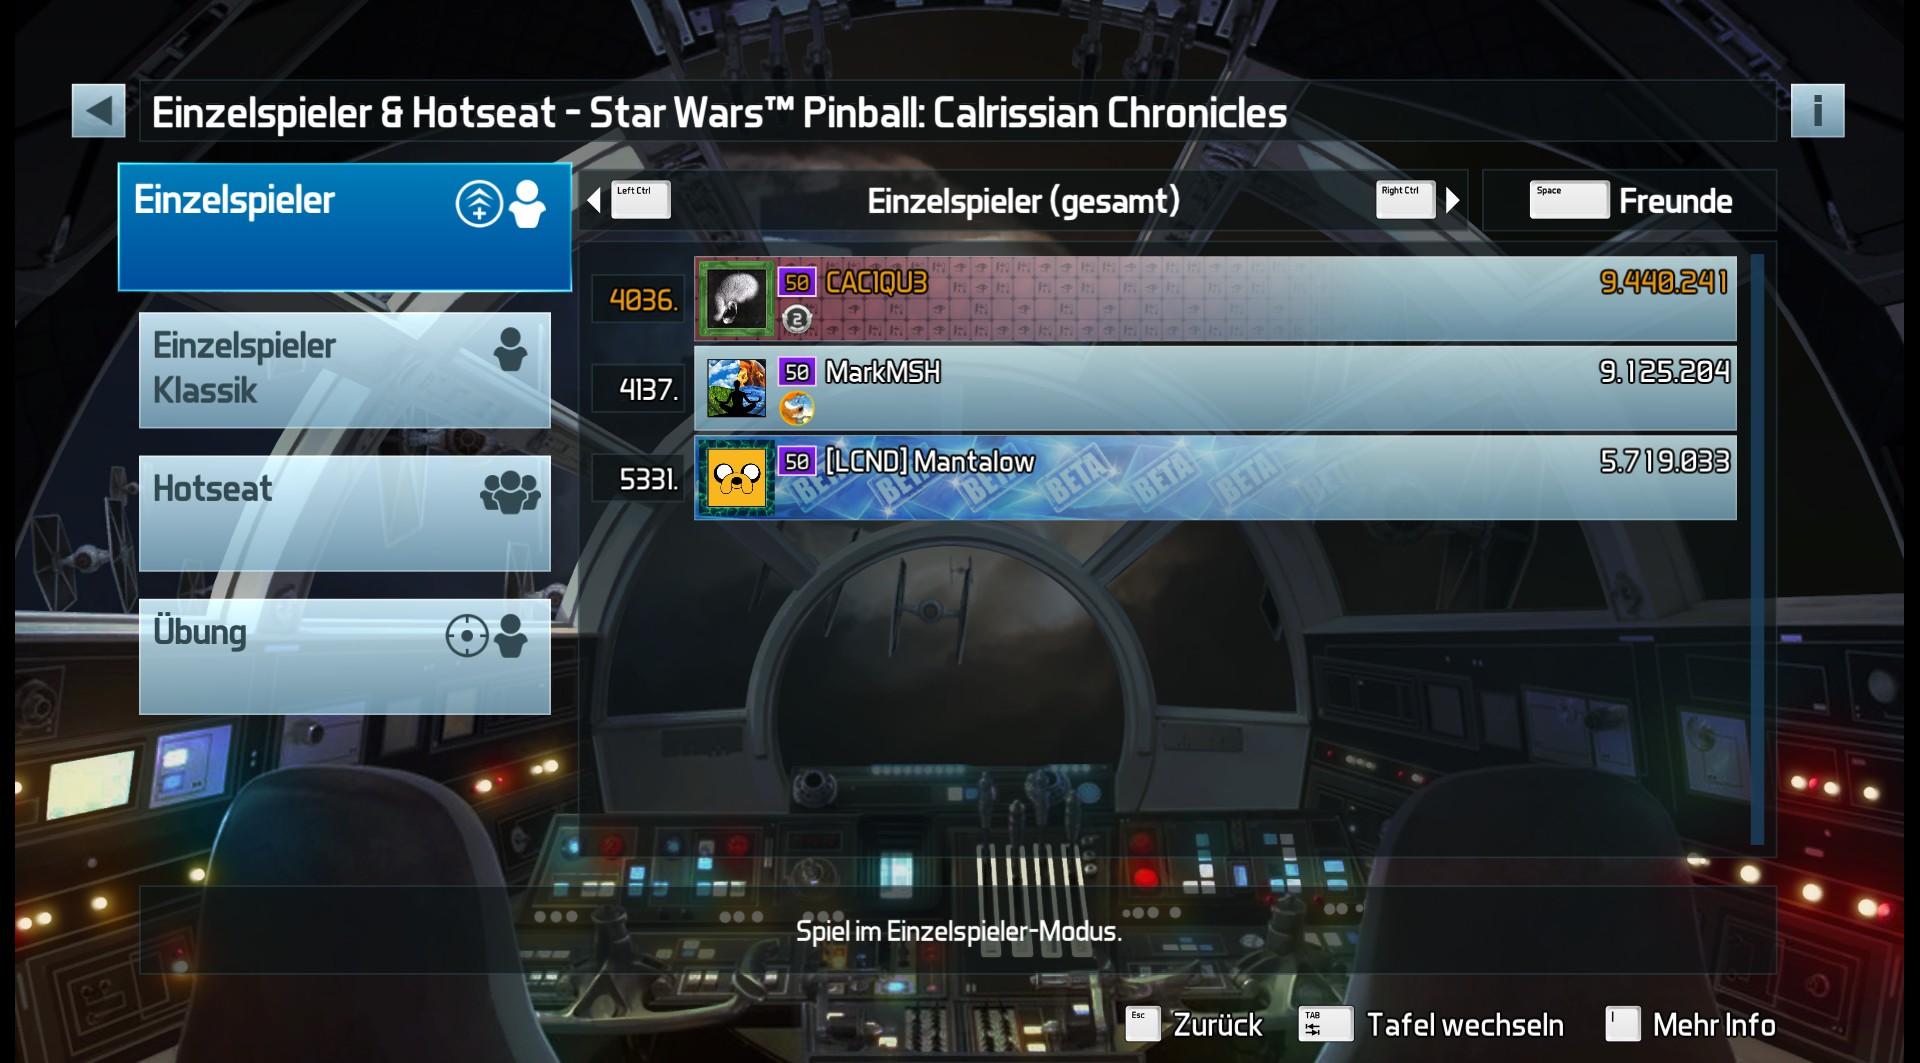 CAC1QU3: Pinball FX3: Star Wars Pinball: Calrissian Chronicles (PC) 9,440,241 points on 2019-05-02 13:13:19